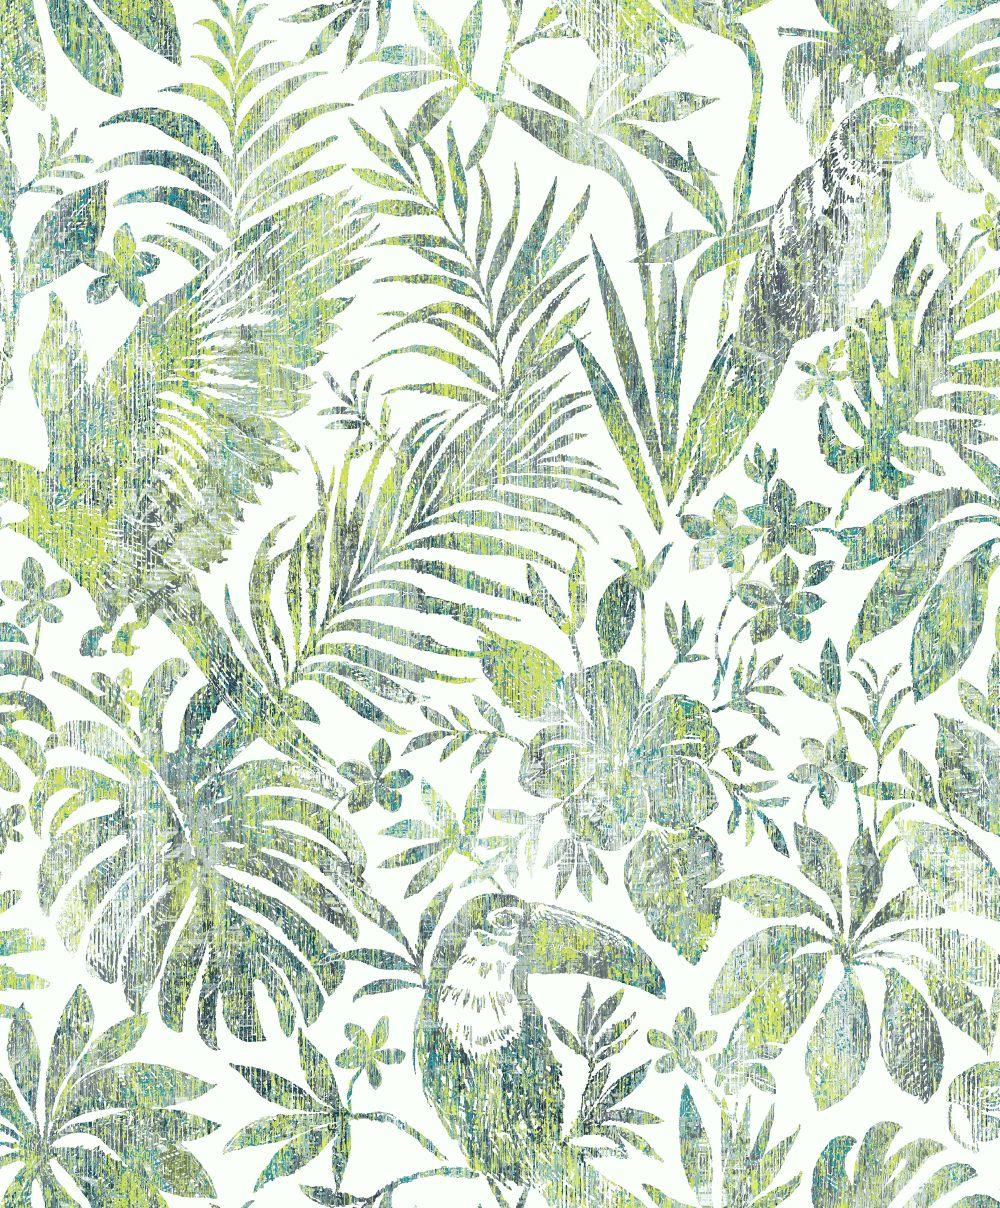 Albany Distressed Jungle Green Wallpaper - Product code: L68504